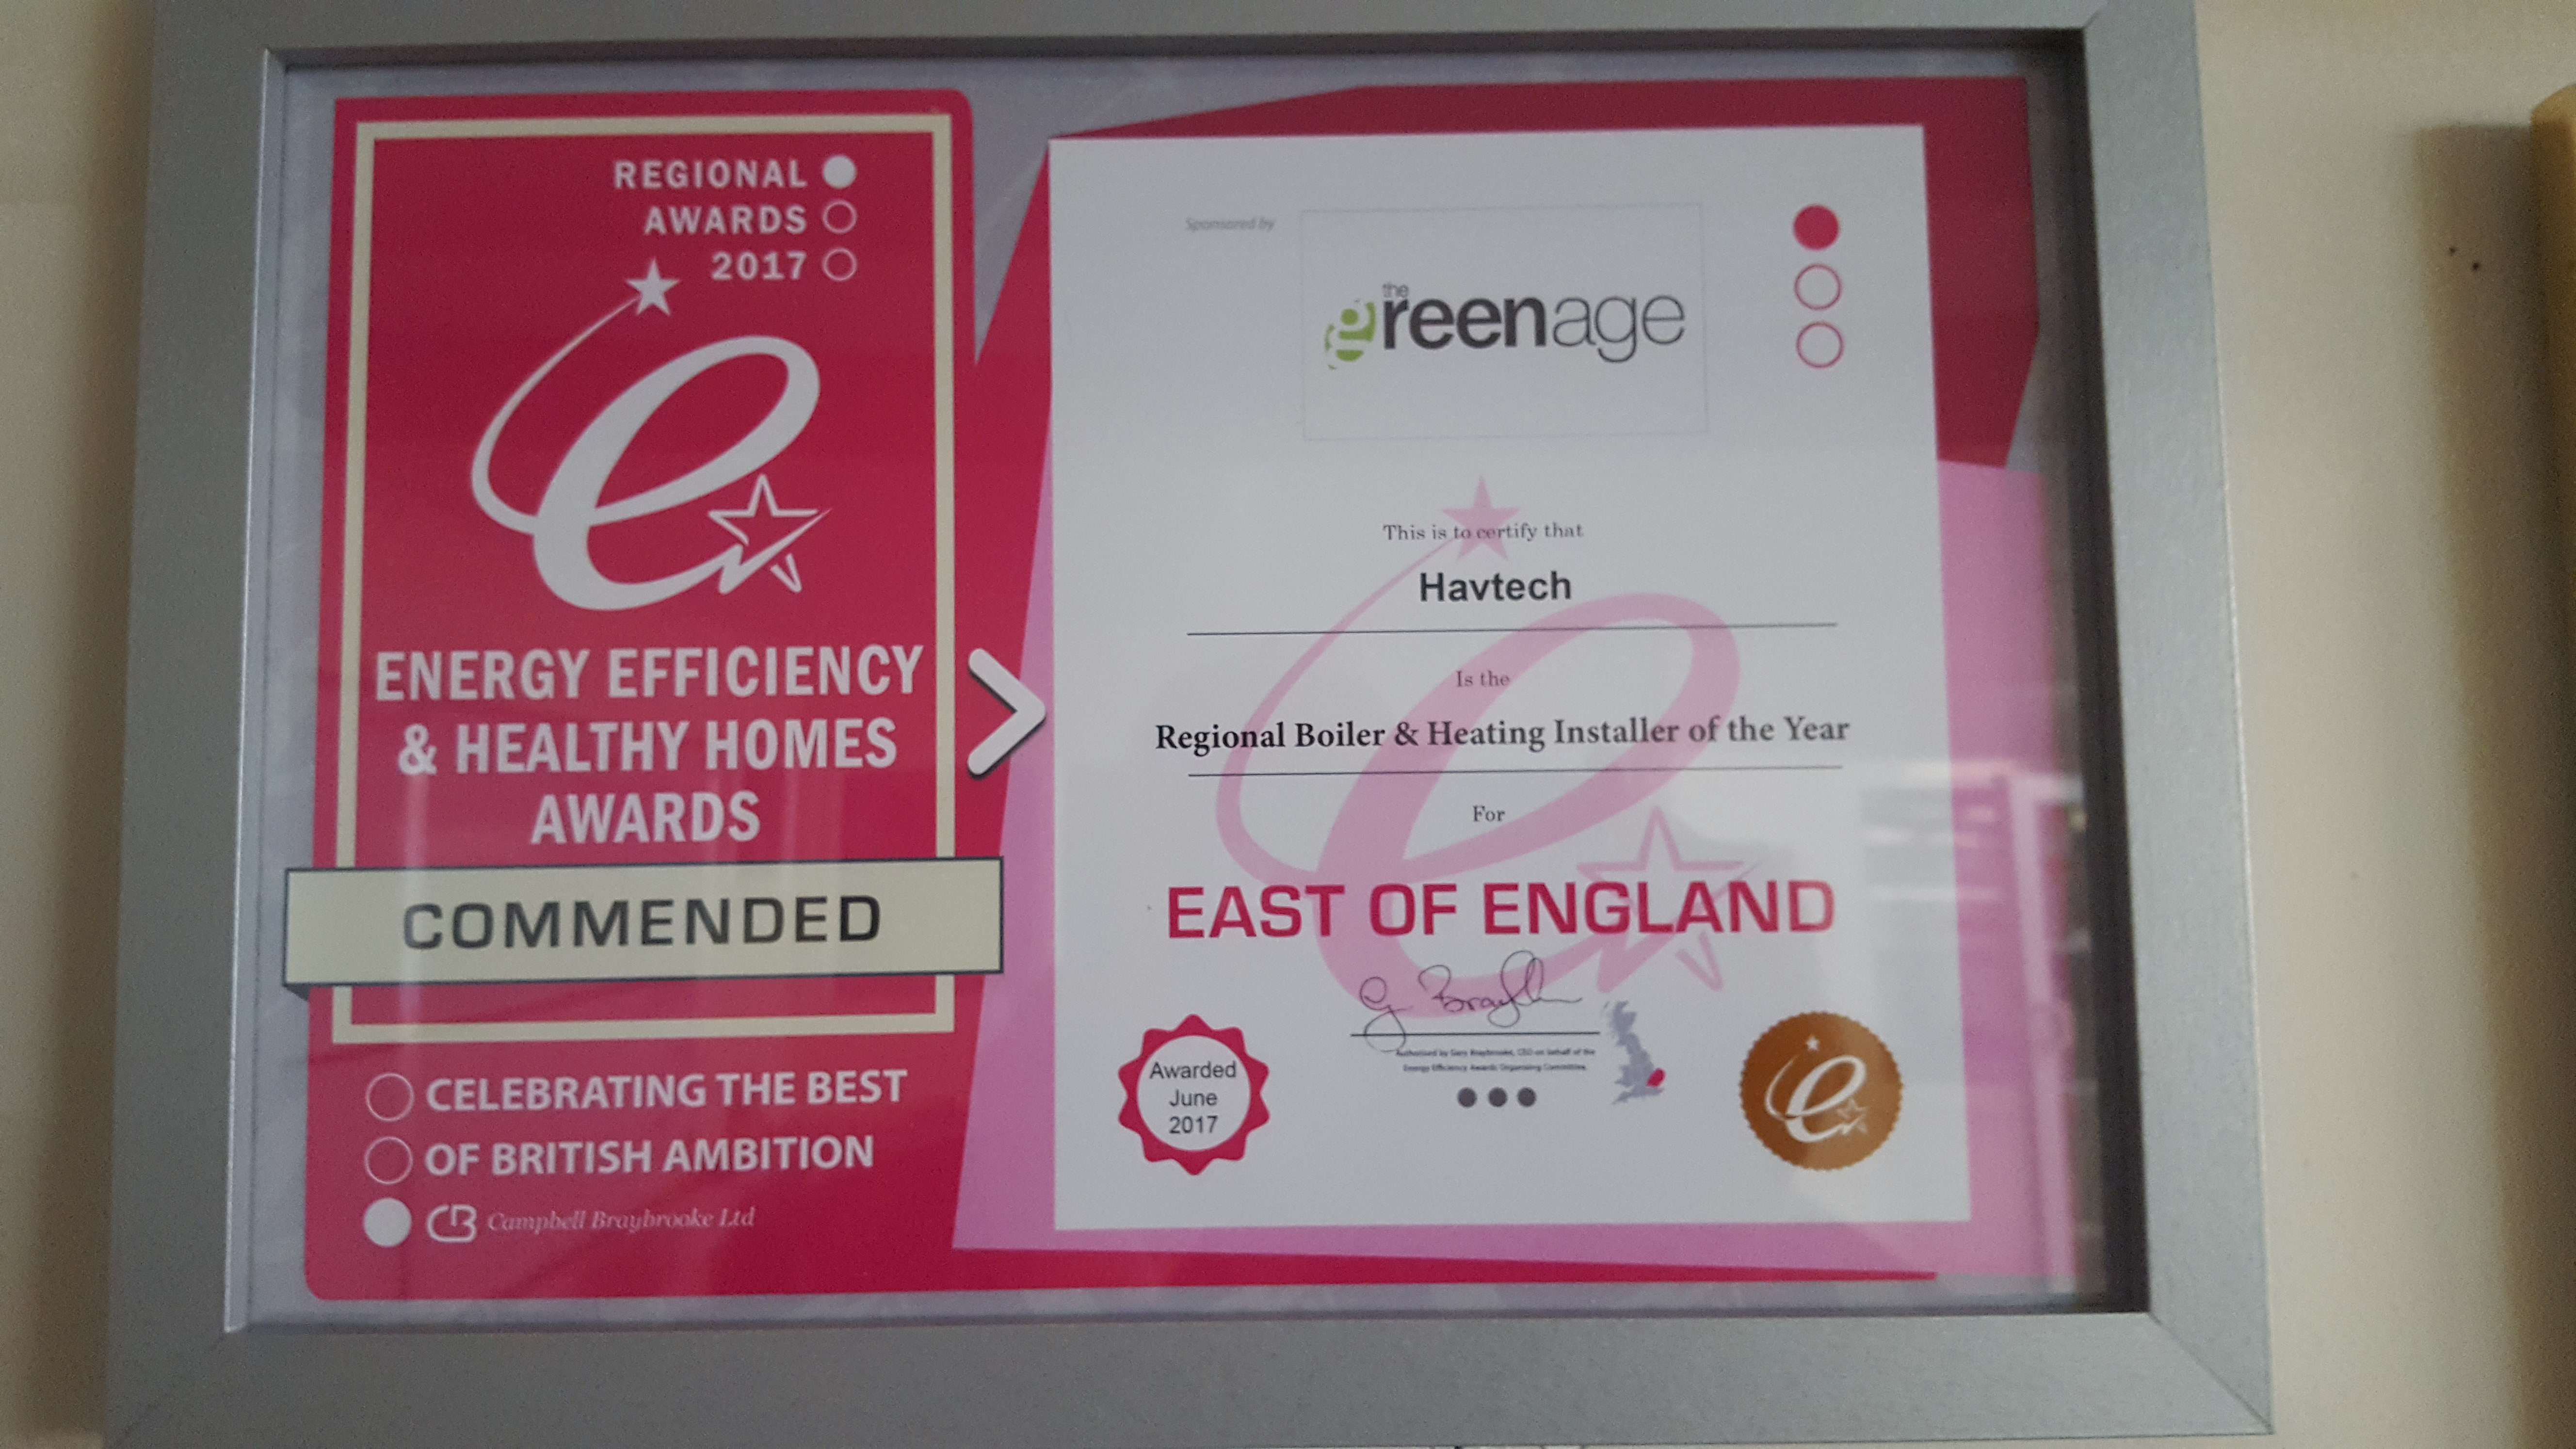 Havtech Regional Boiler & Heating Installer of the Year certificate